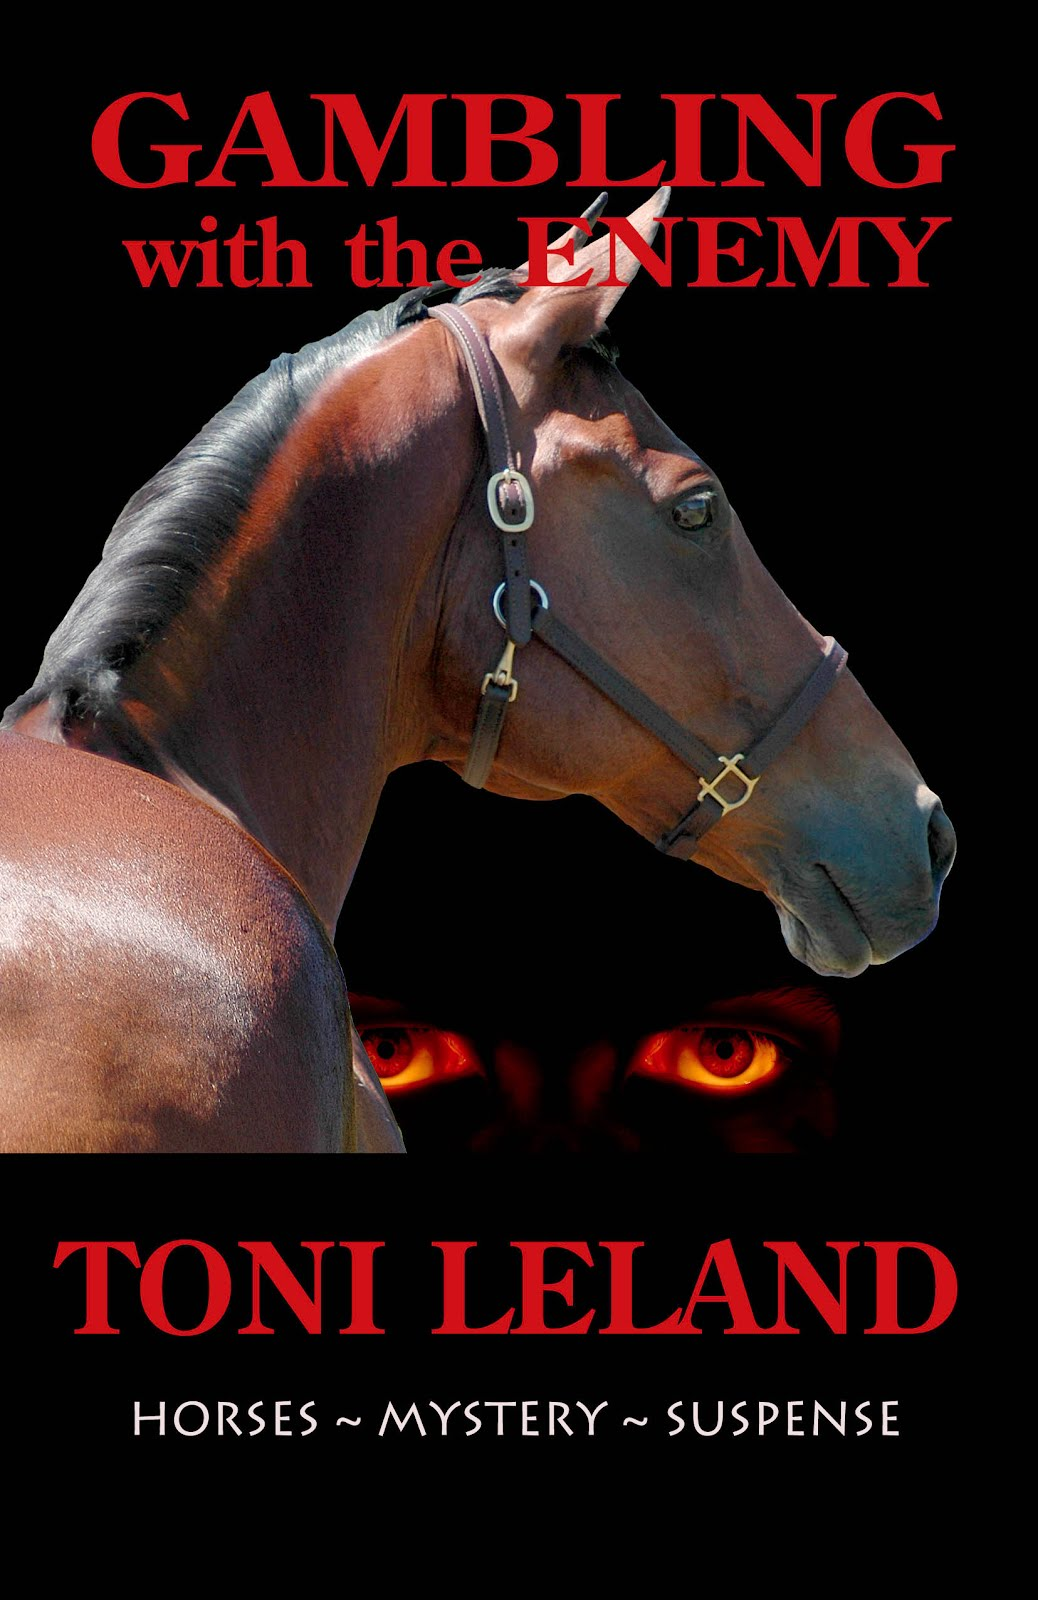 Toni Leland Horse Mysteries